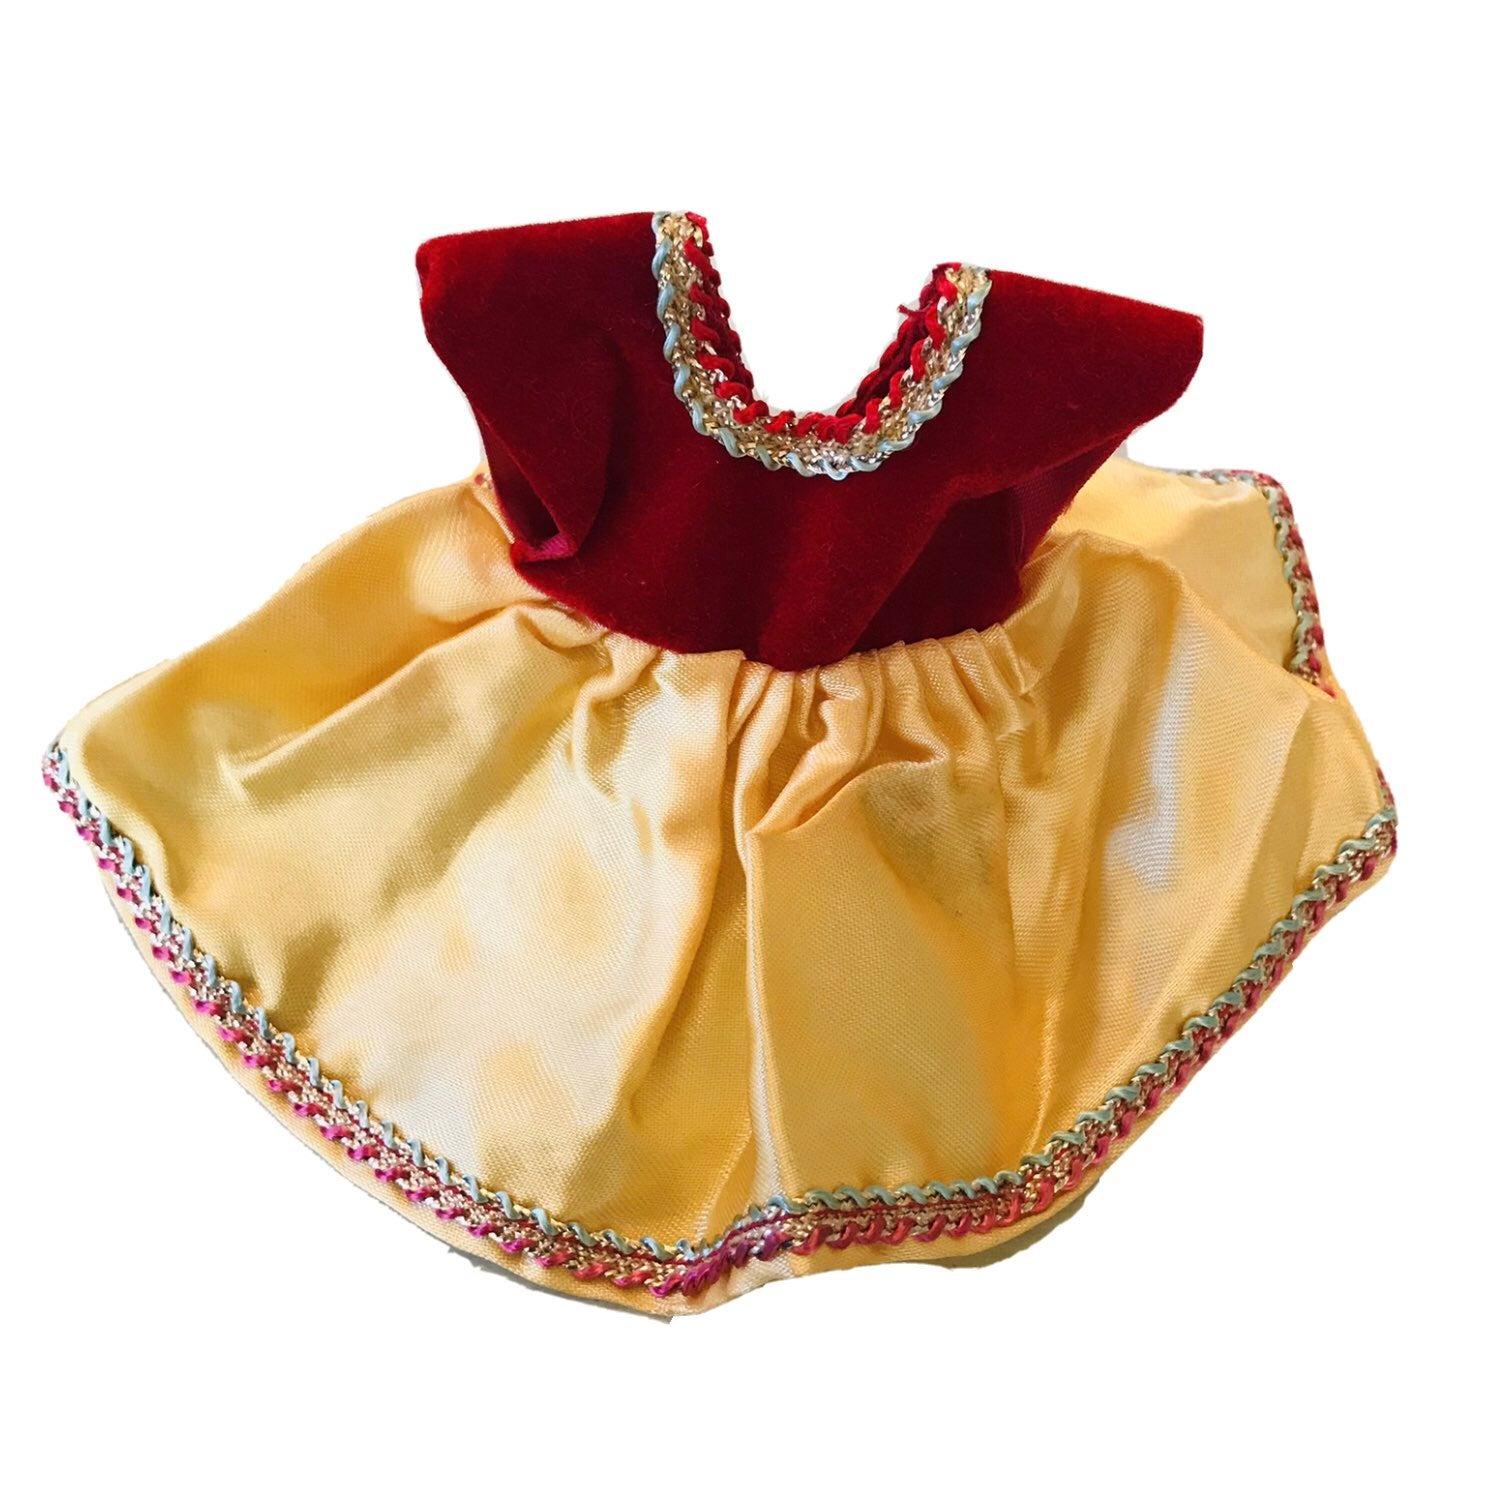 "Vintage 8"" Doll Dress Fits Ginny Fancy"